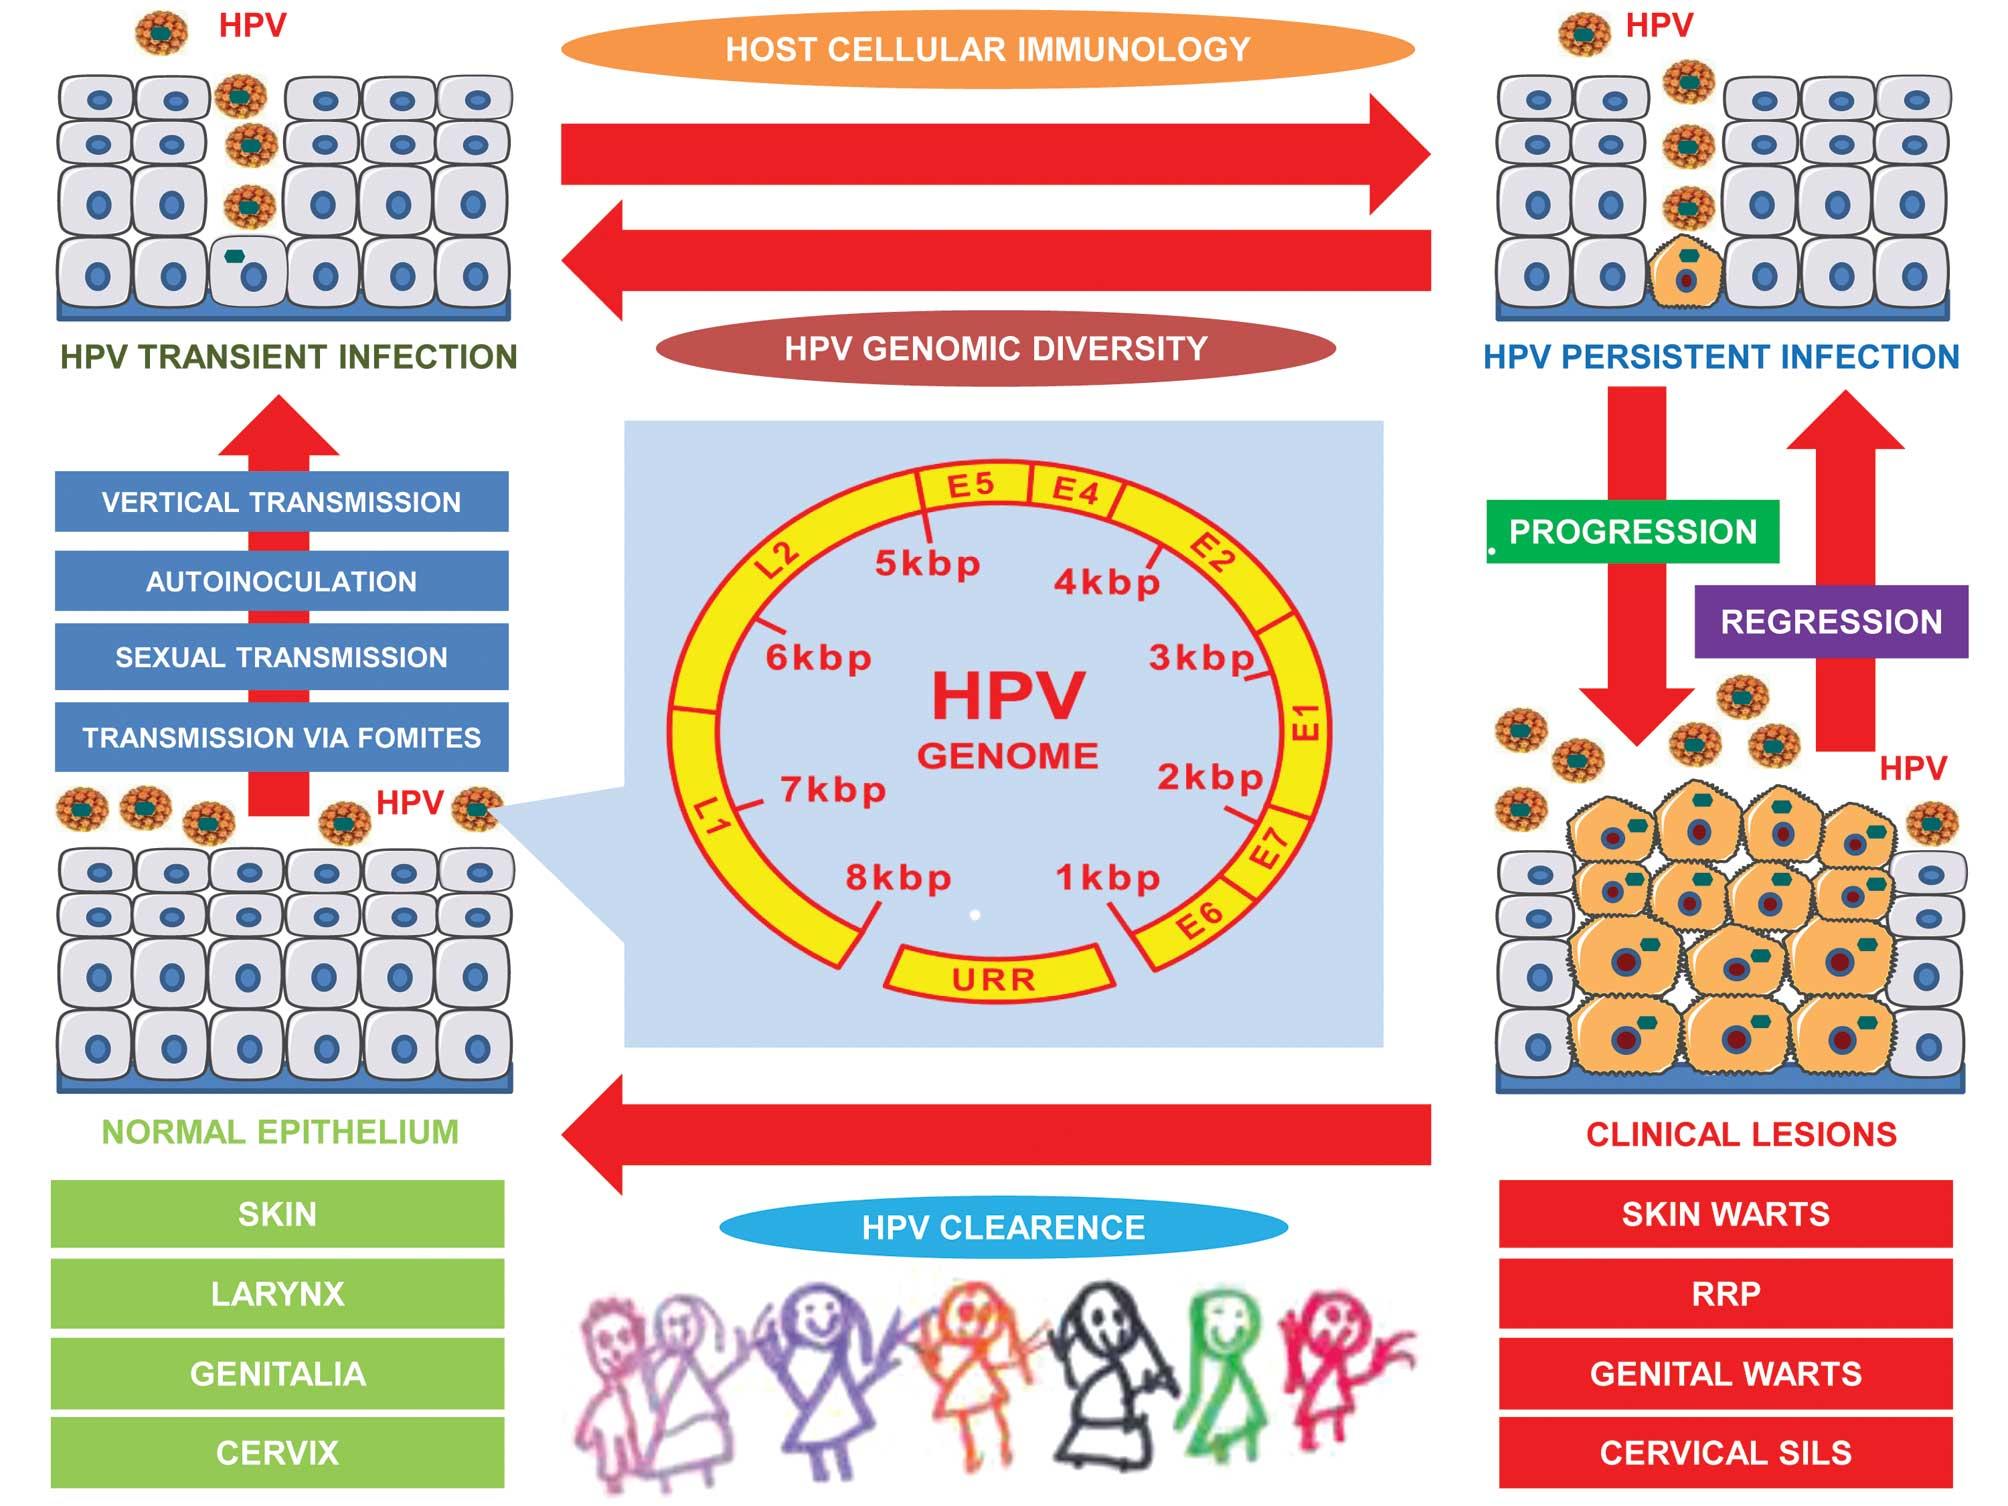 papillomavirus et hpv